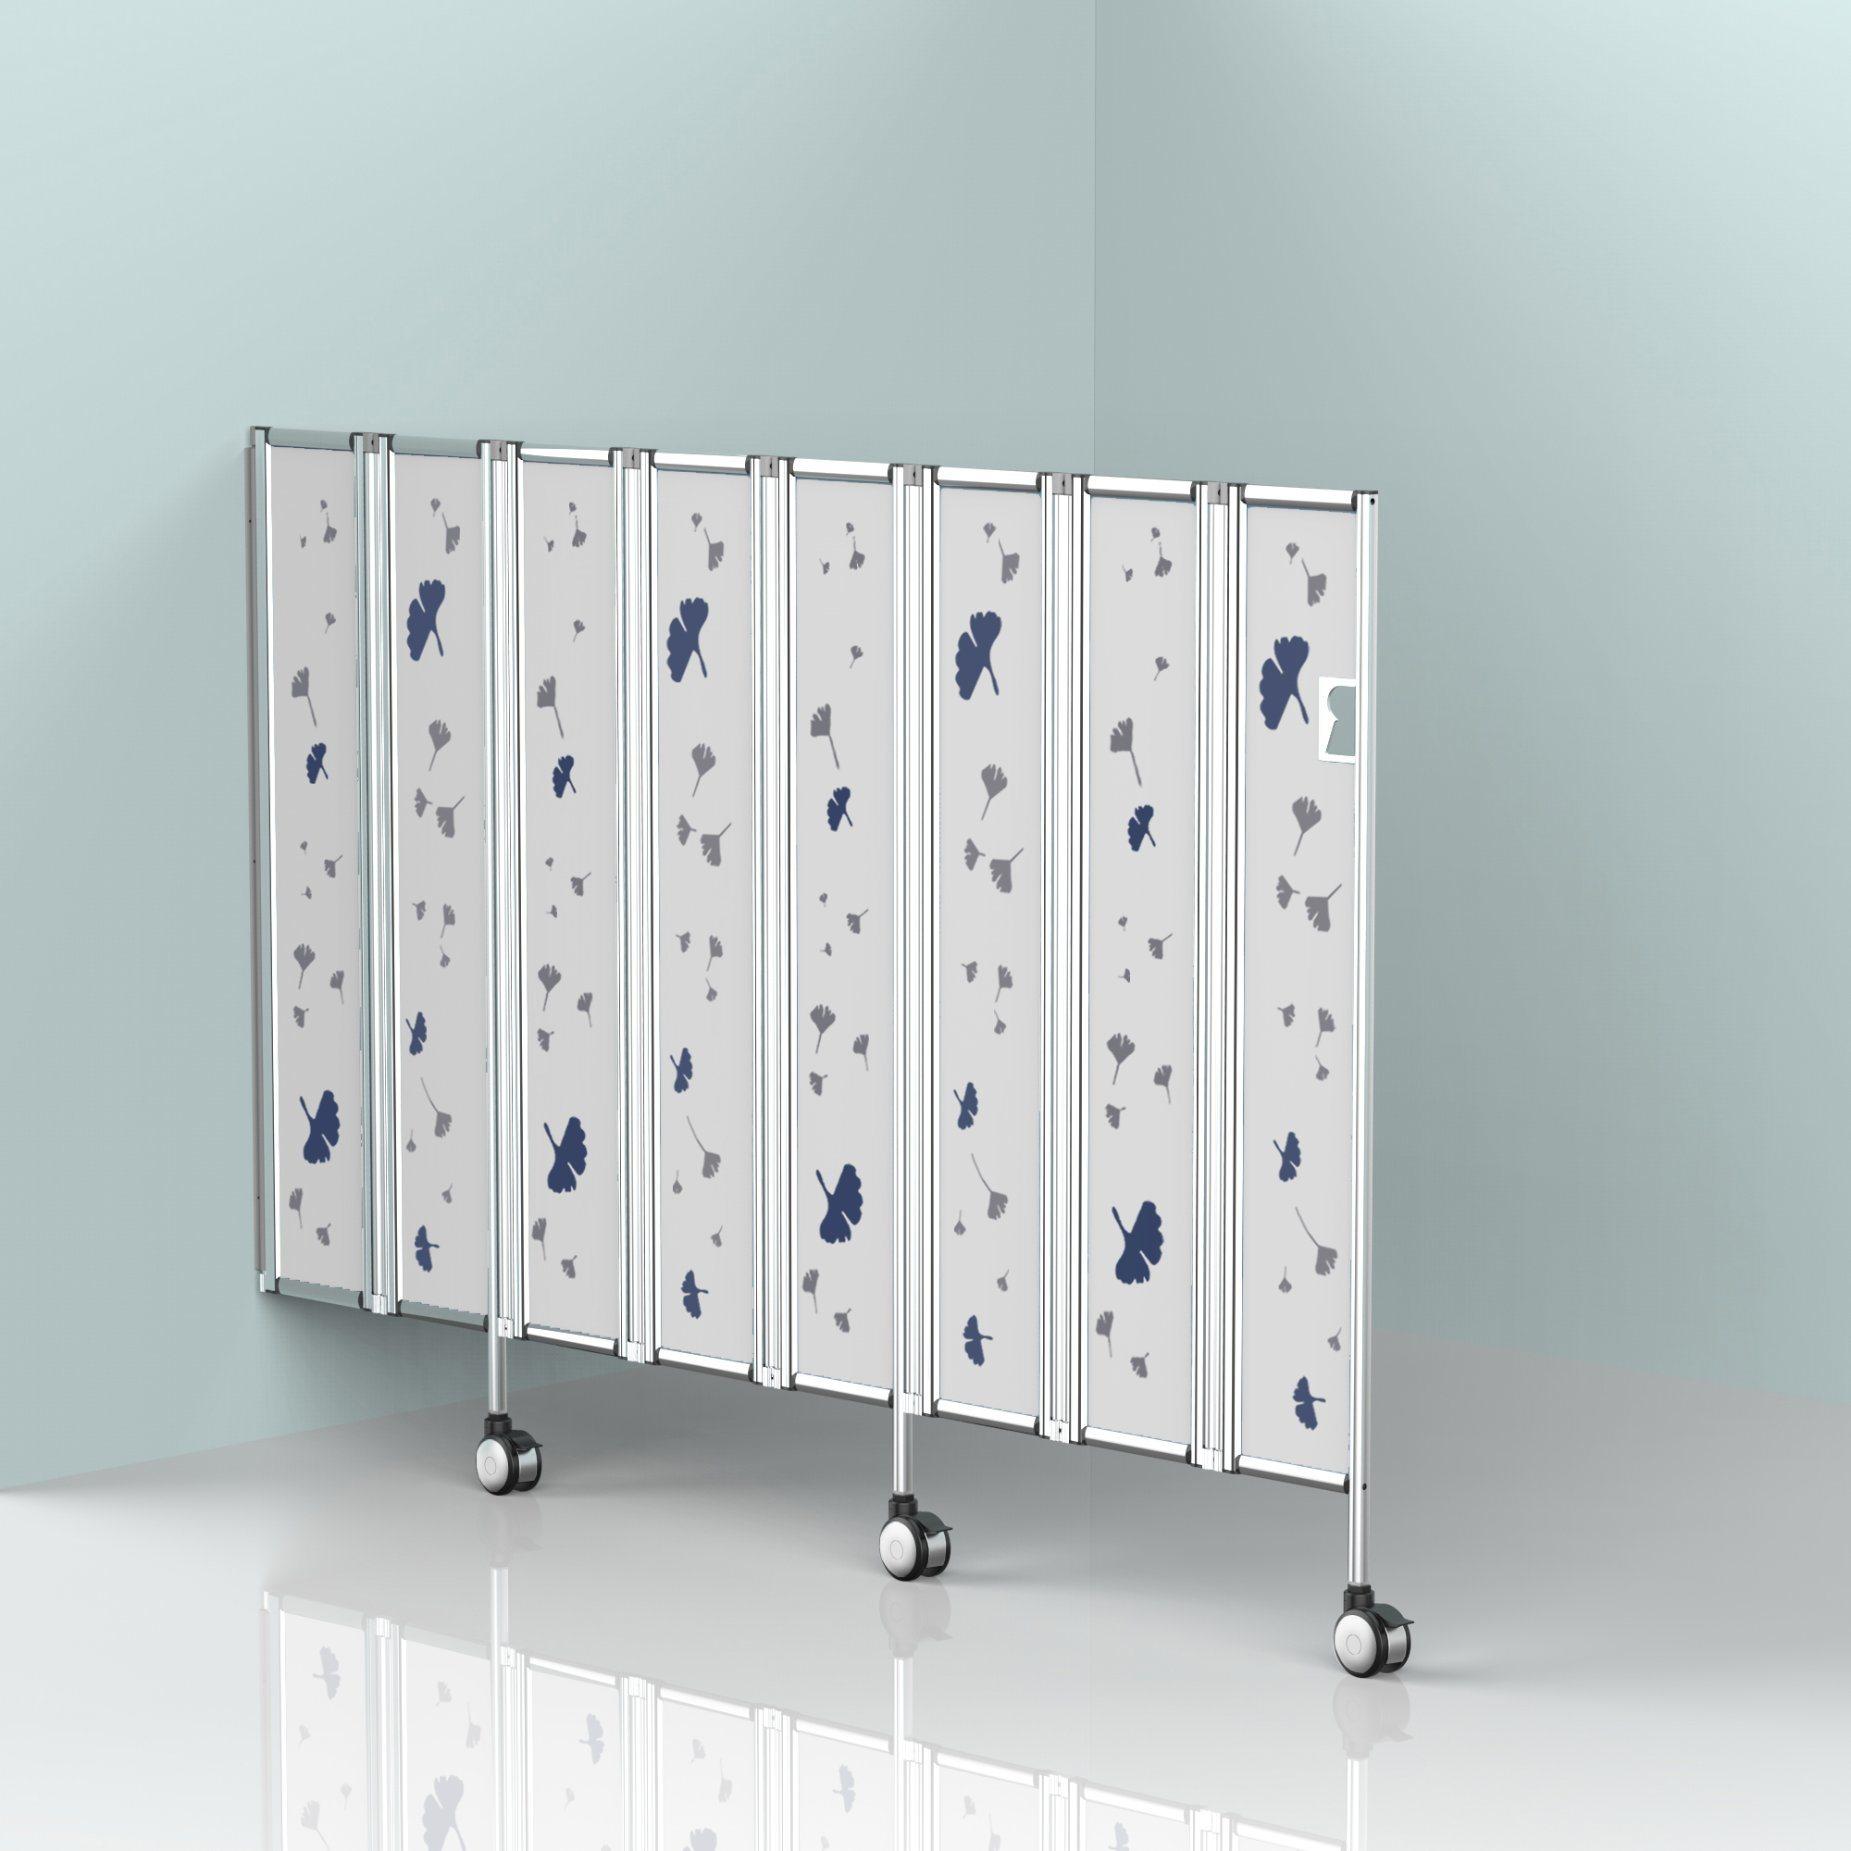 China Aluminium Profile Folding Screen Room Divider Chinese Screen Divider Sliding Privacy Screen